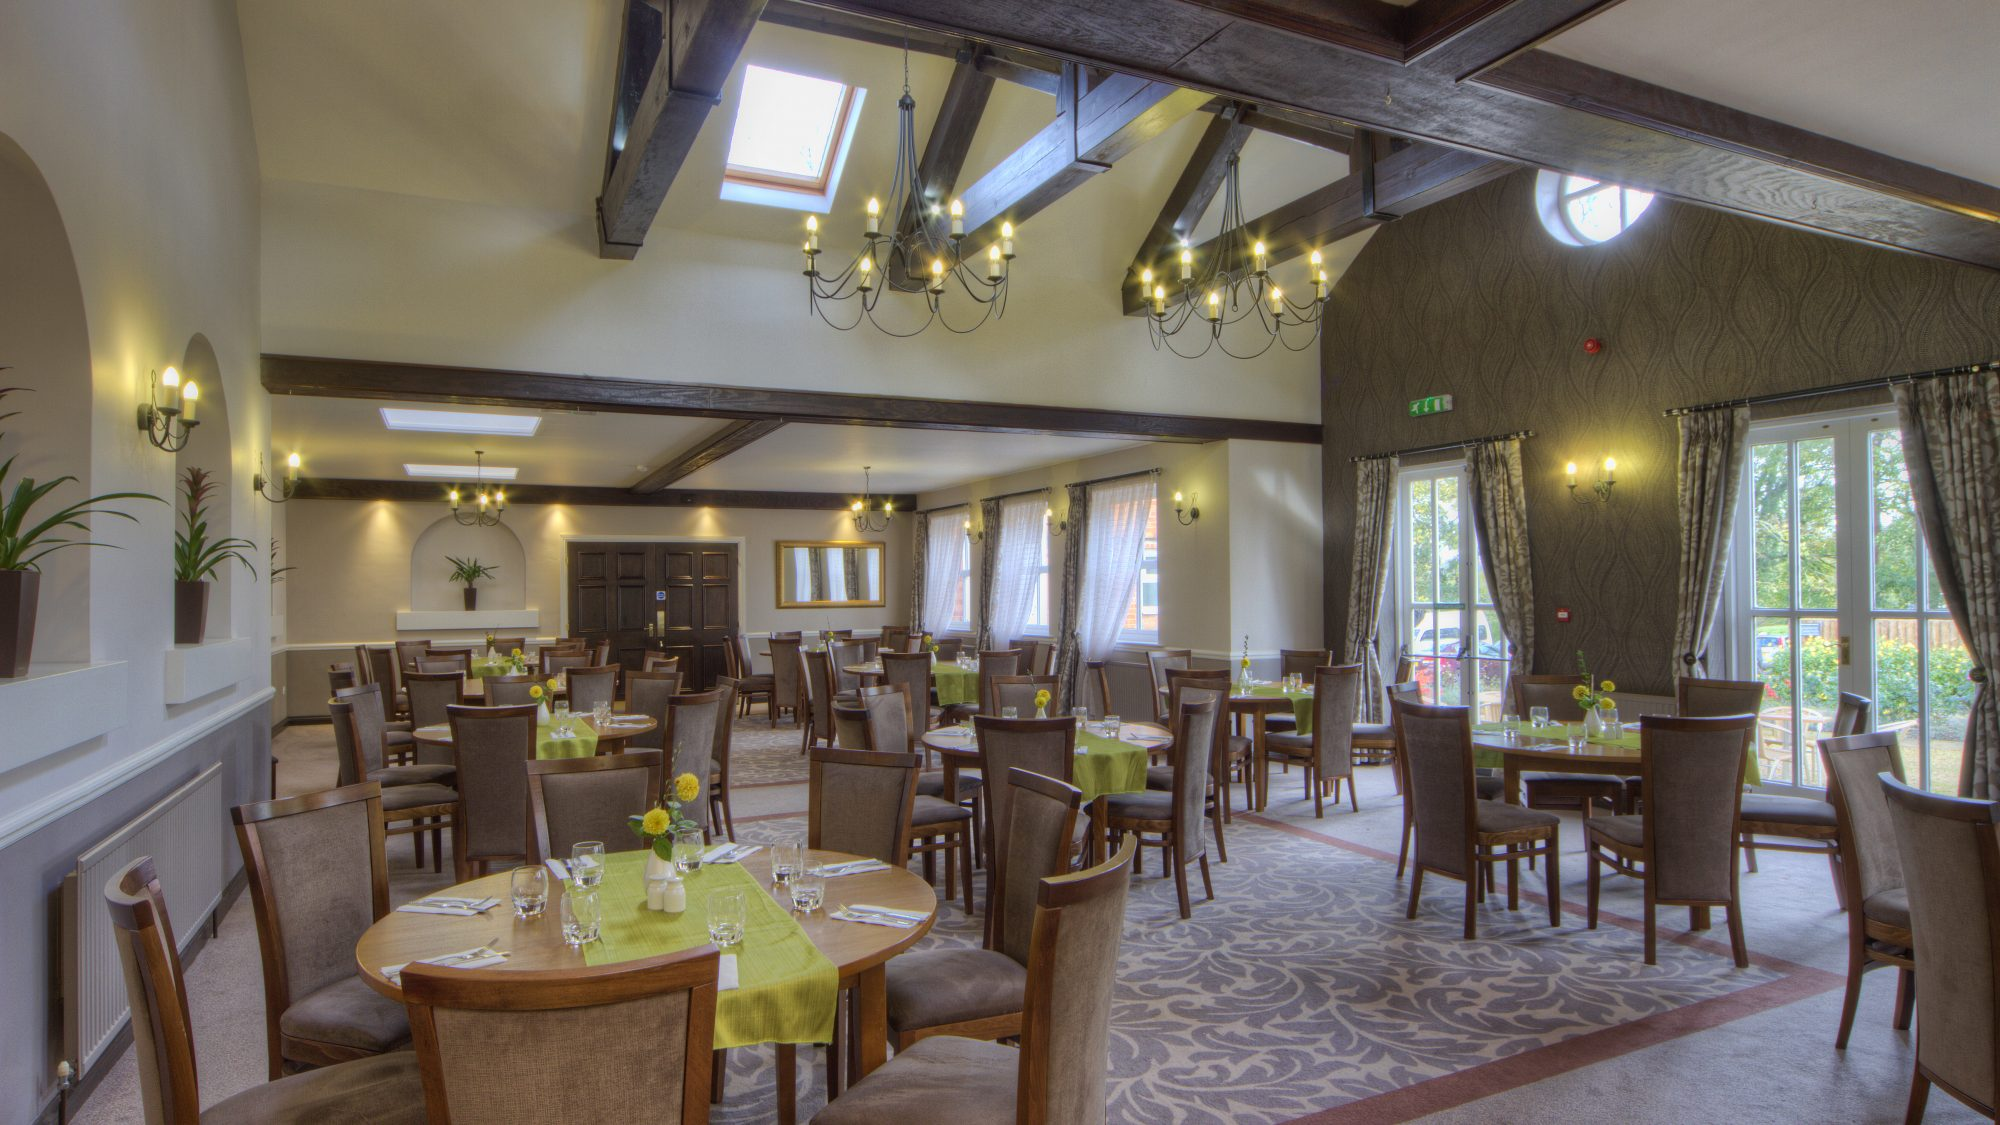 Langton dining room Hothorpe Hall